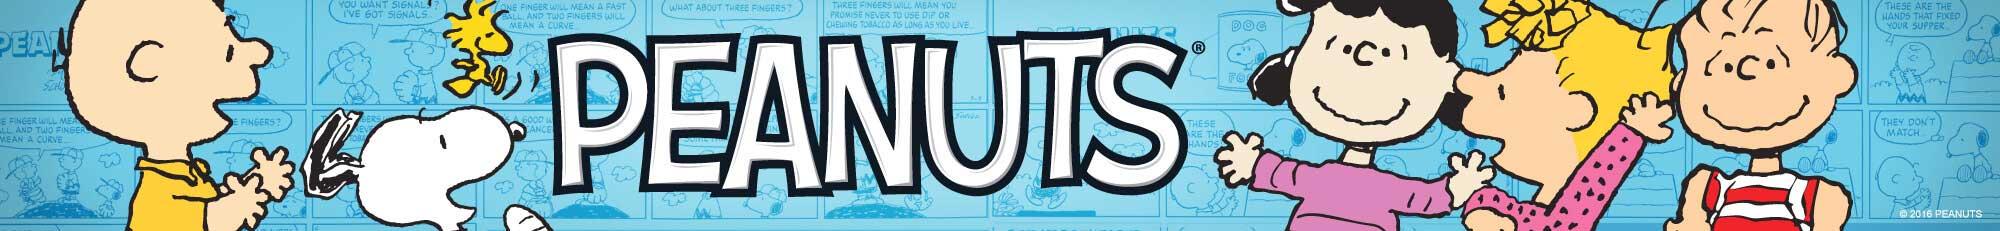 Peanuts Banner